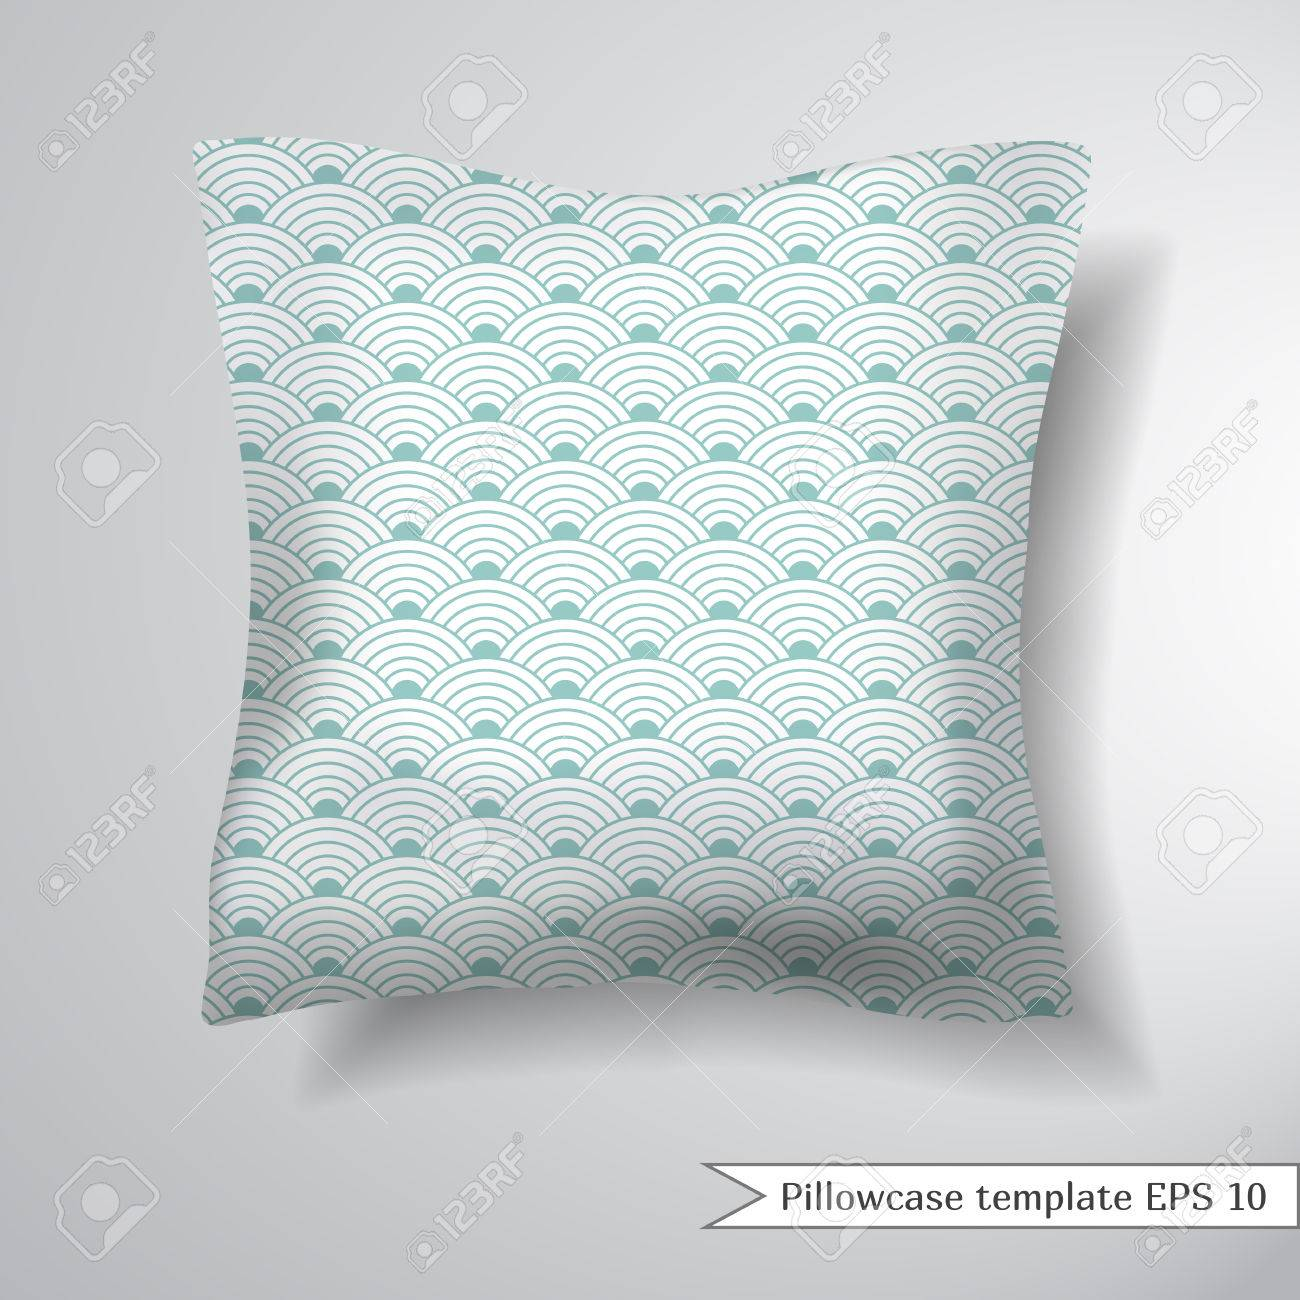 creative sofa square pillow decorative pillowcase design template